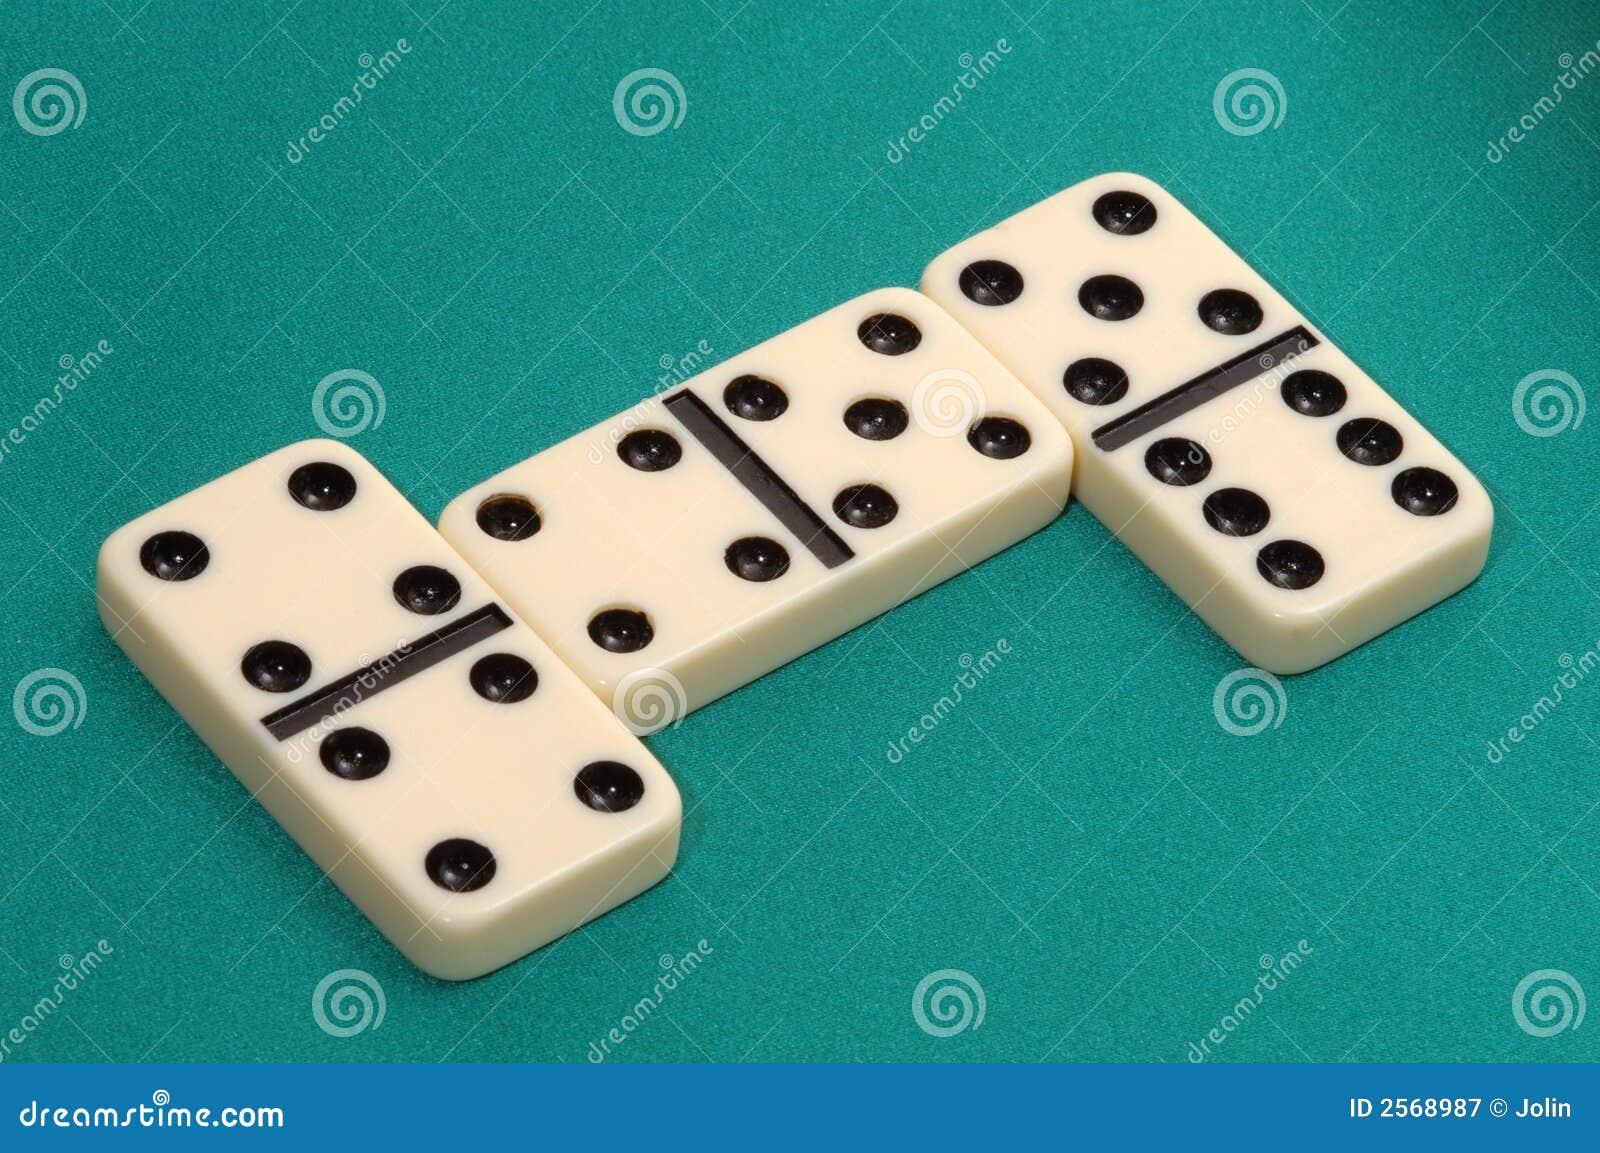 Dominoes online - The number one free Dominoes game